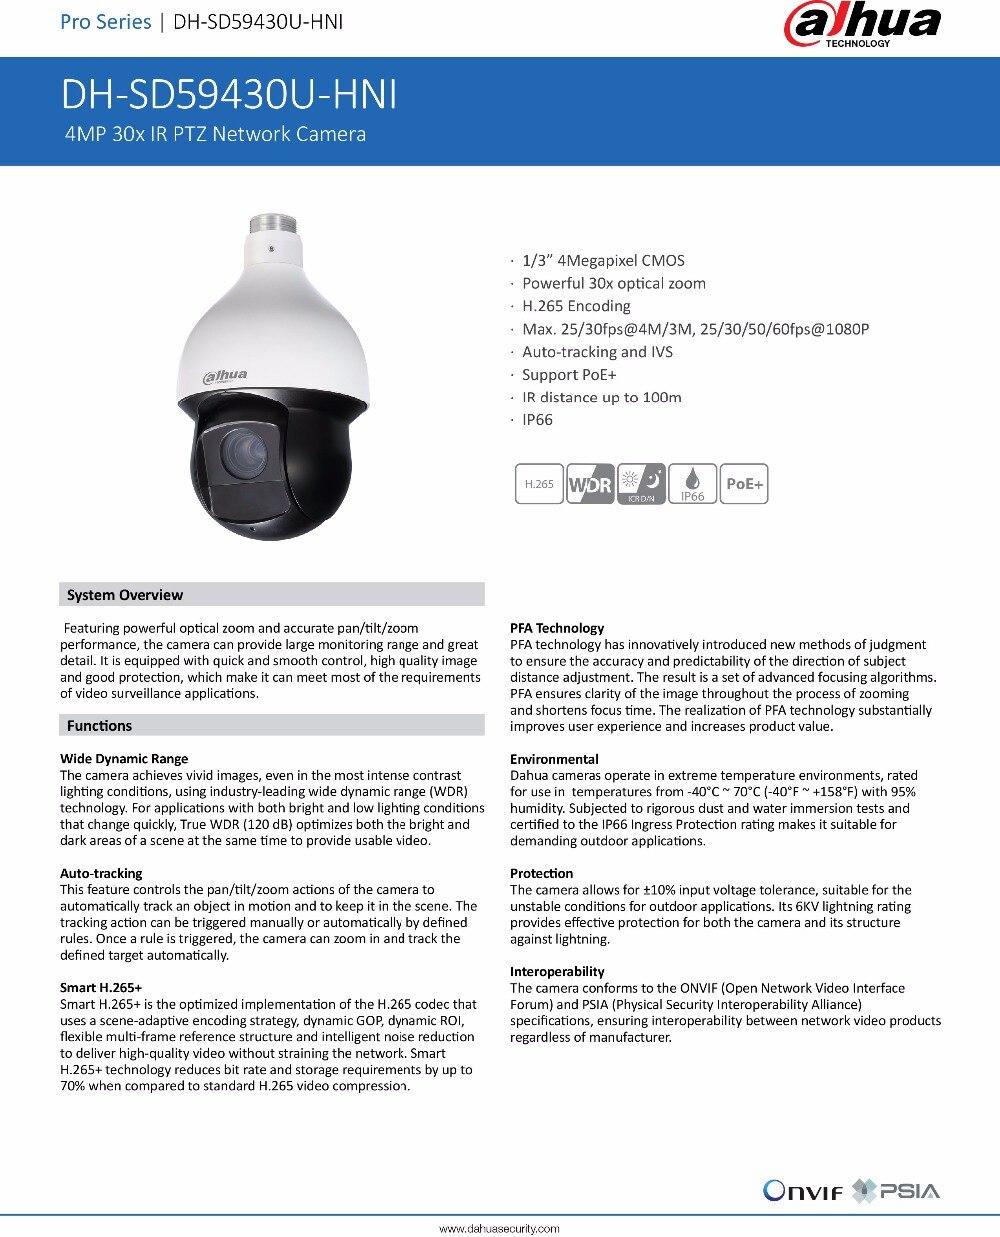 SD59430U-HNI_Datasheet_20171211-1